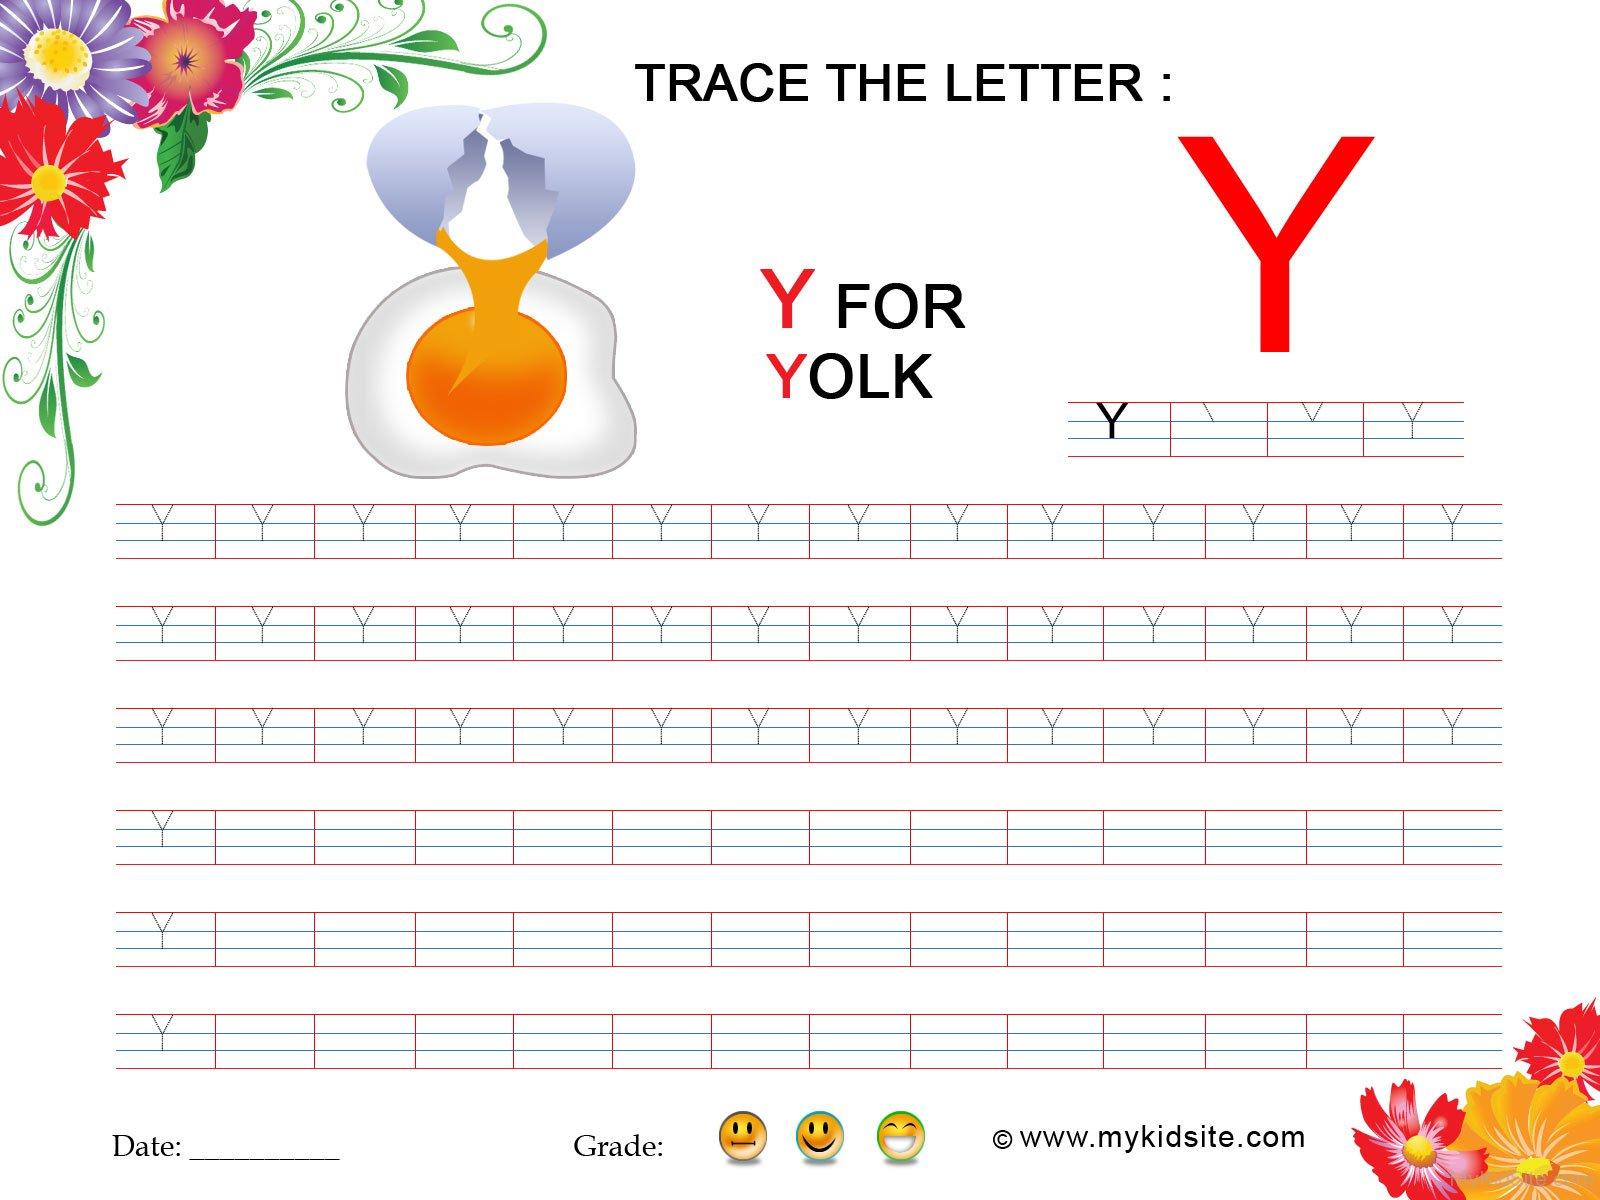 Tracing Worksheet For Letter Y